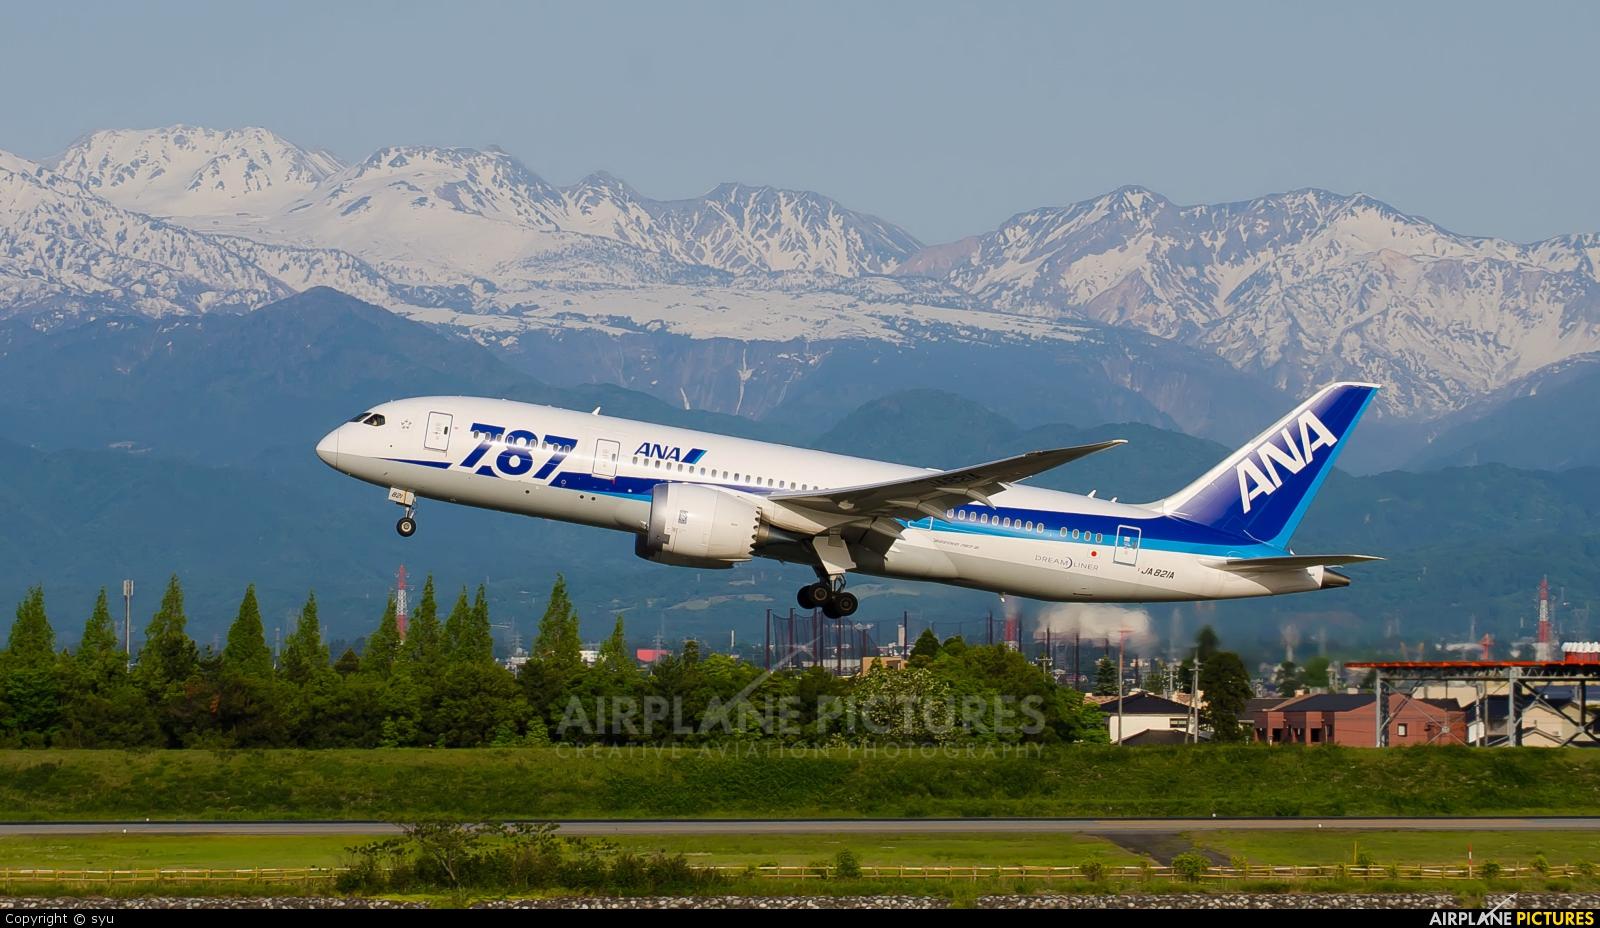 ANA - All Nippon Airways JA821A aircraft at Toyama